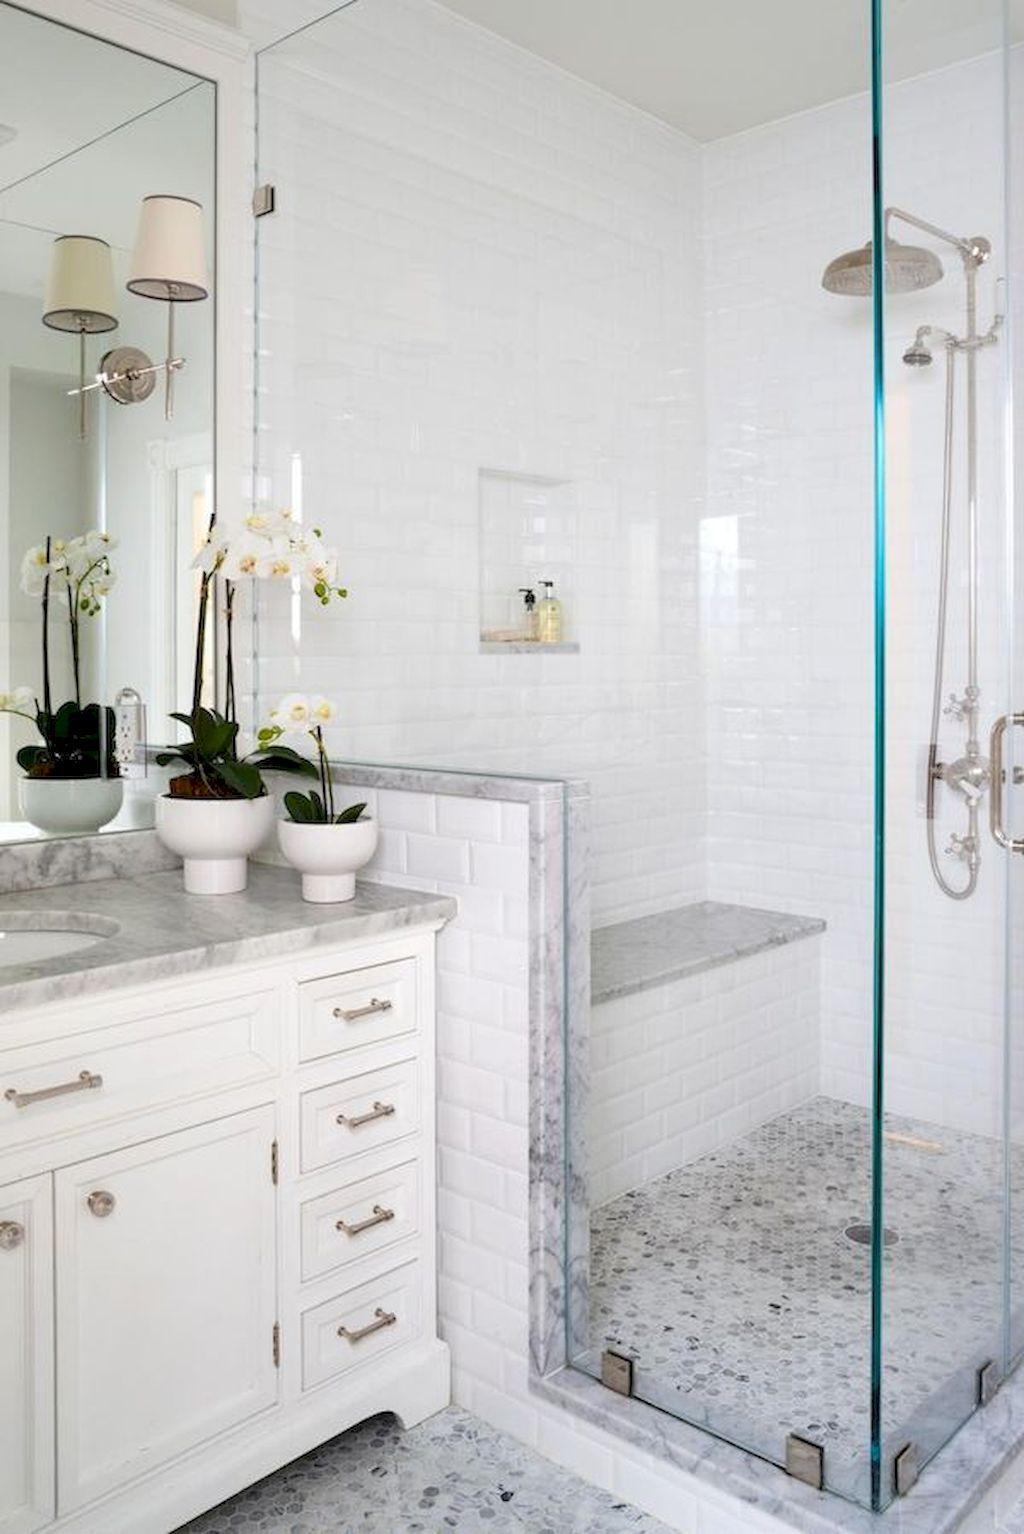 55 cool small master bathroom remodel ideas minimalist on amazing small bathroom designs and ideas id=29615